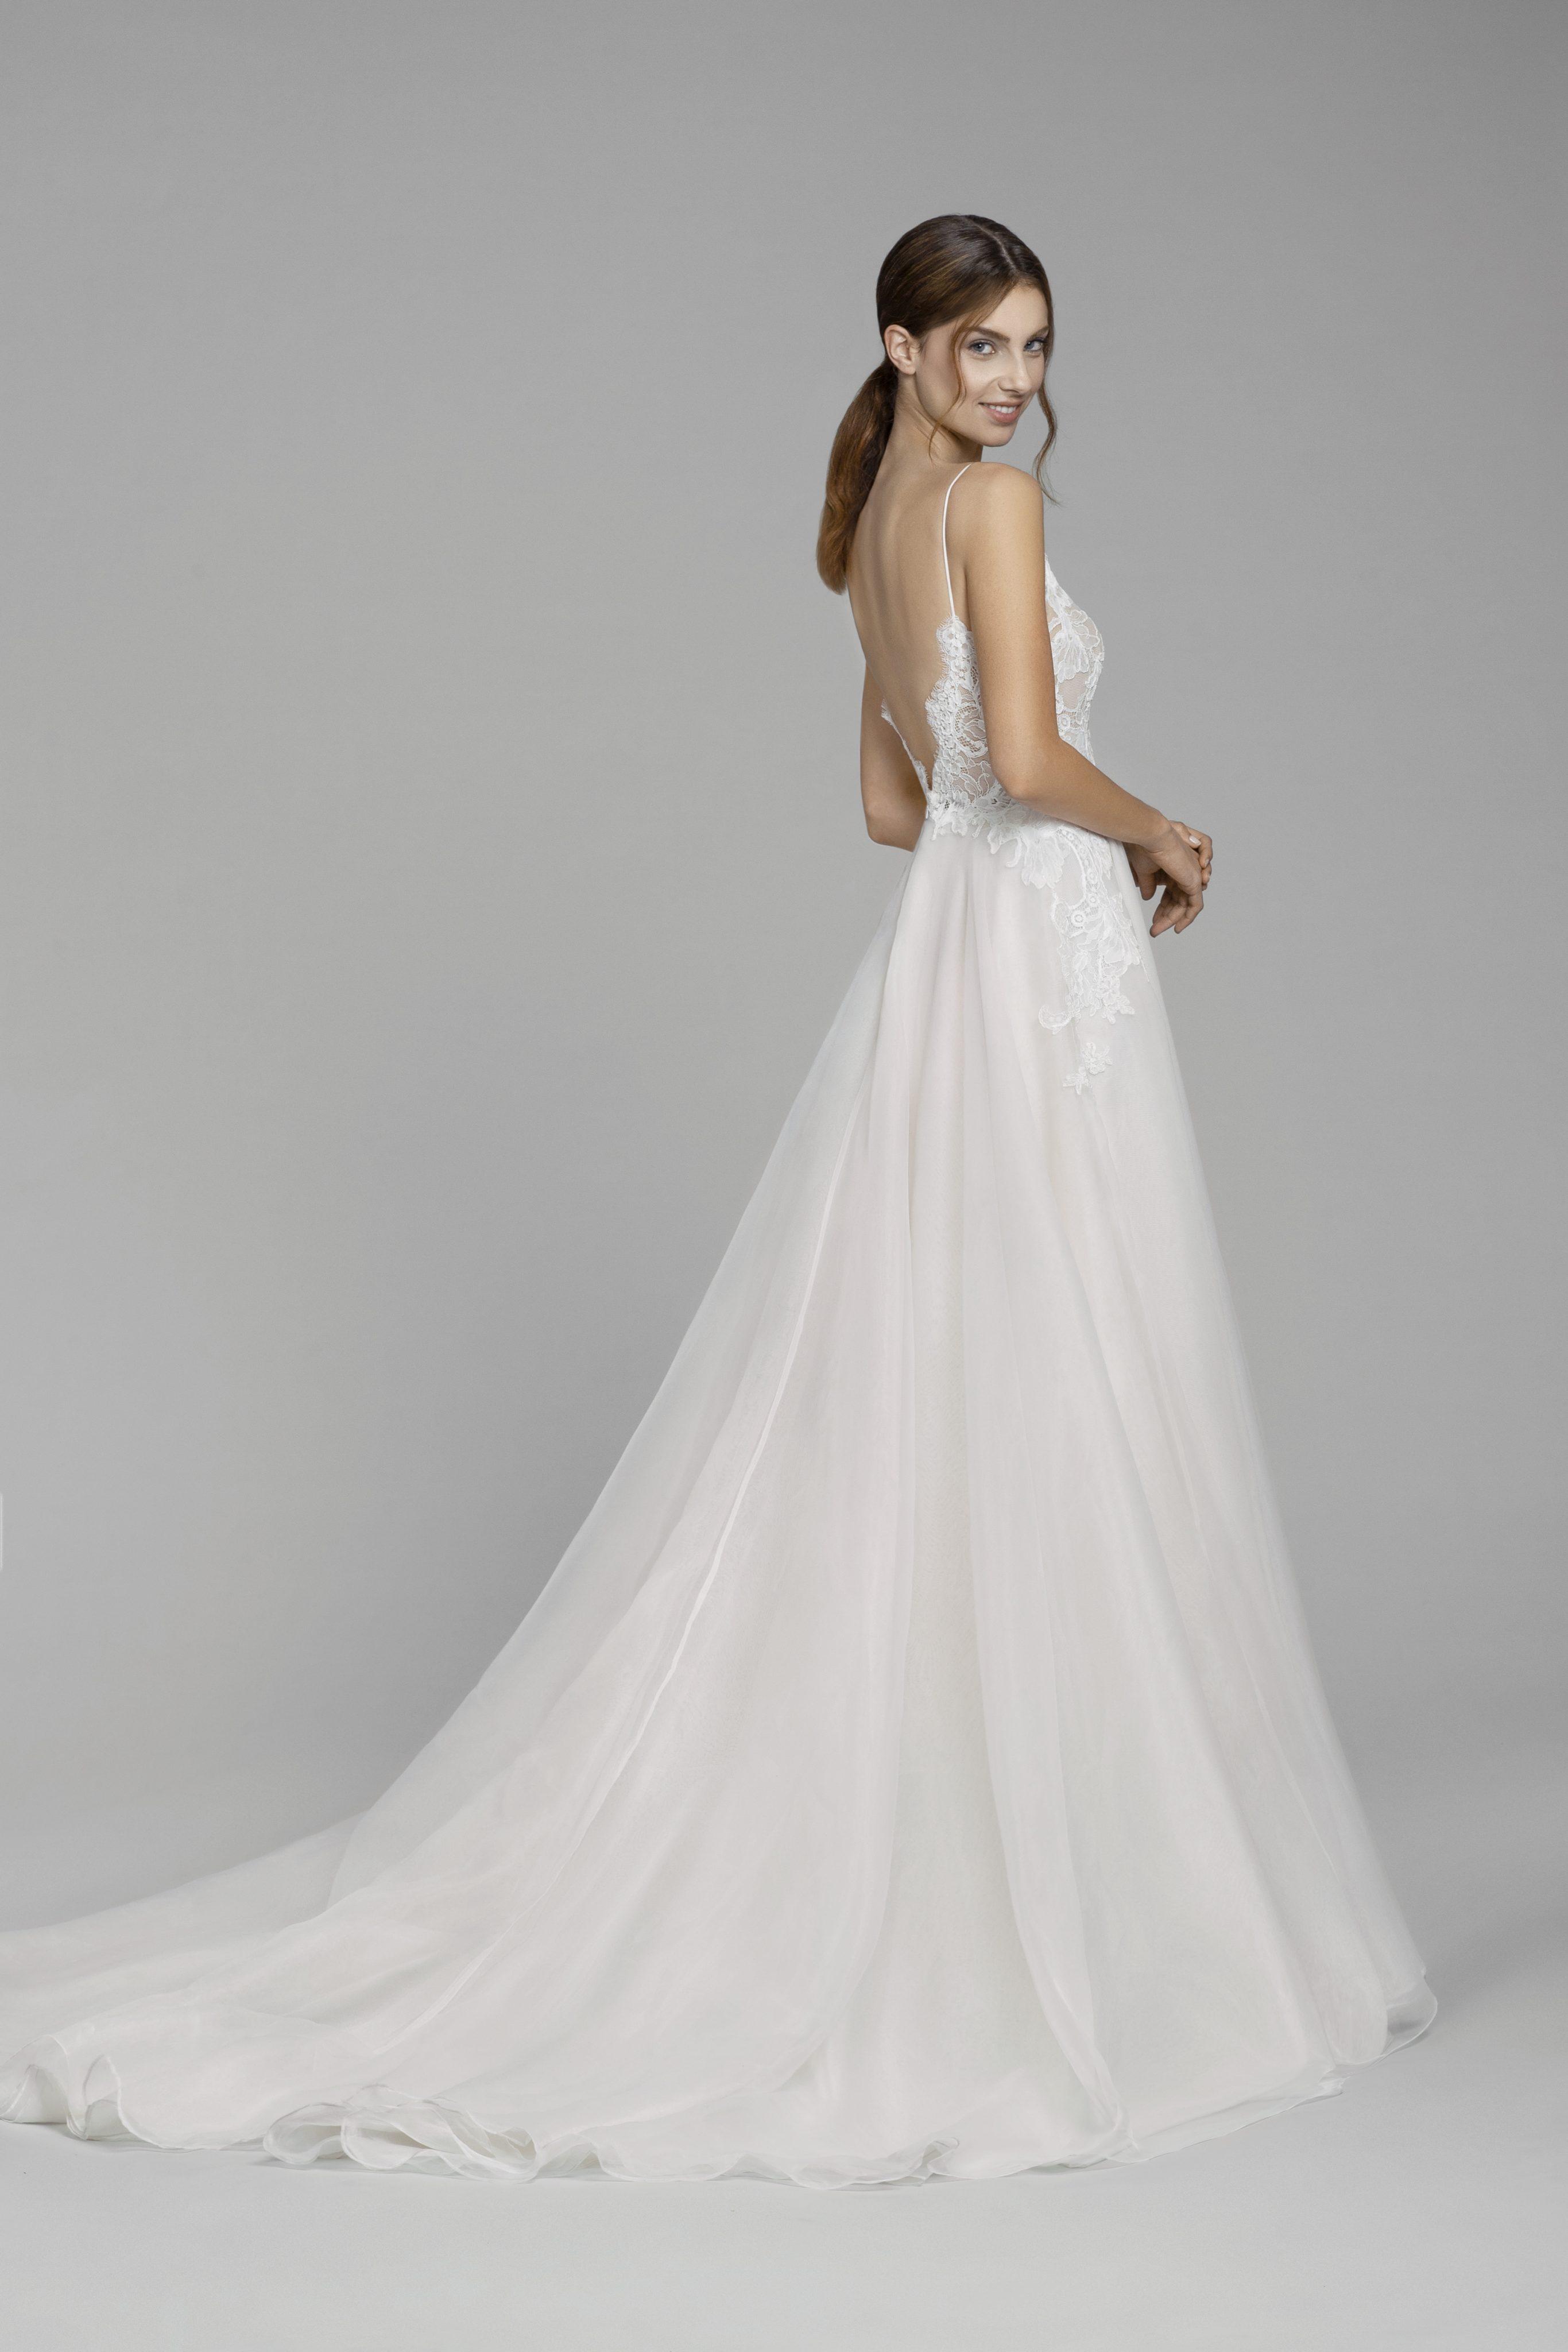 d5a393ca090 V-neck Lace Bodice Spaghetti Strap A-line Wedding Dress | Kleinfeld Bridal